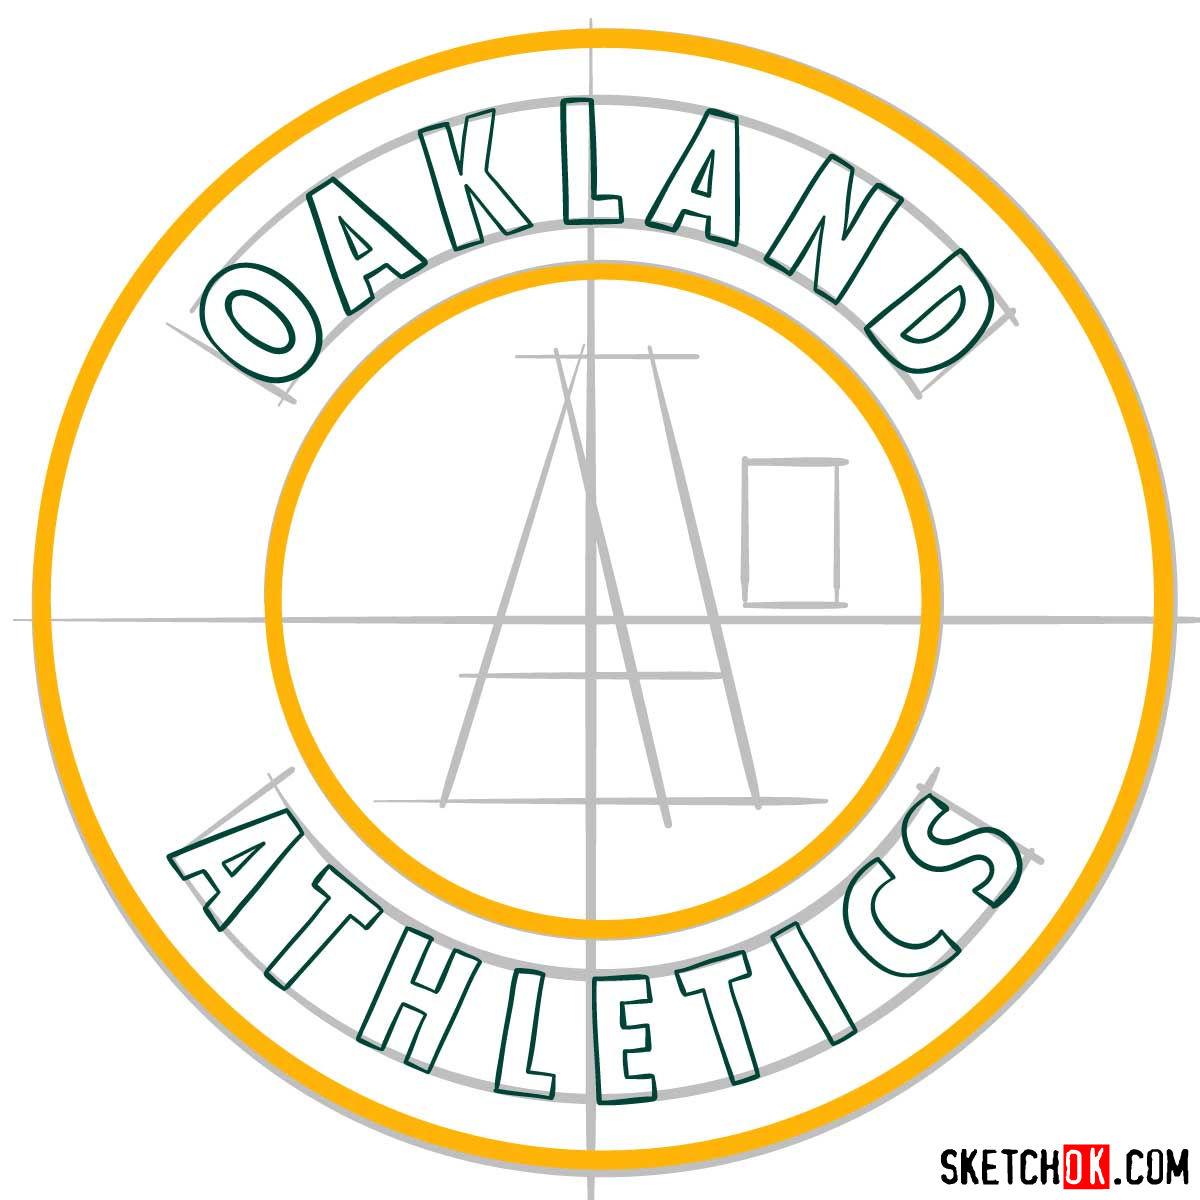 How to draw Oakland Athletics logo | MLB logos - step 07